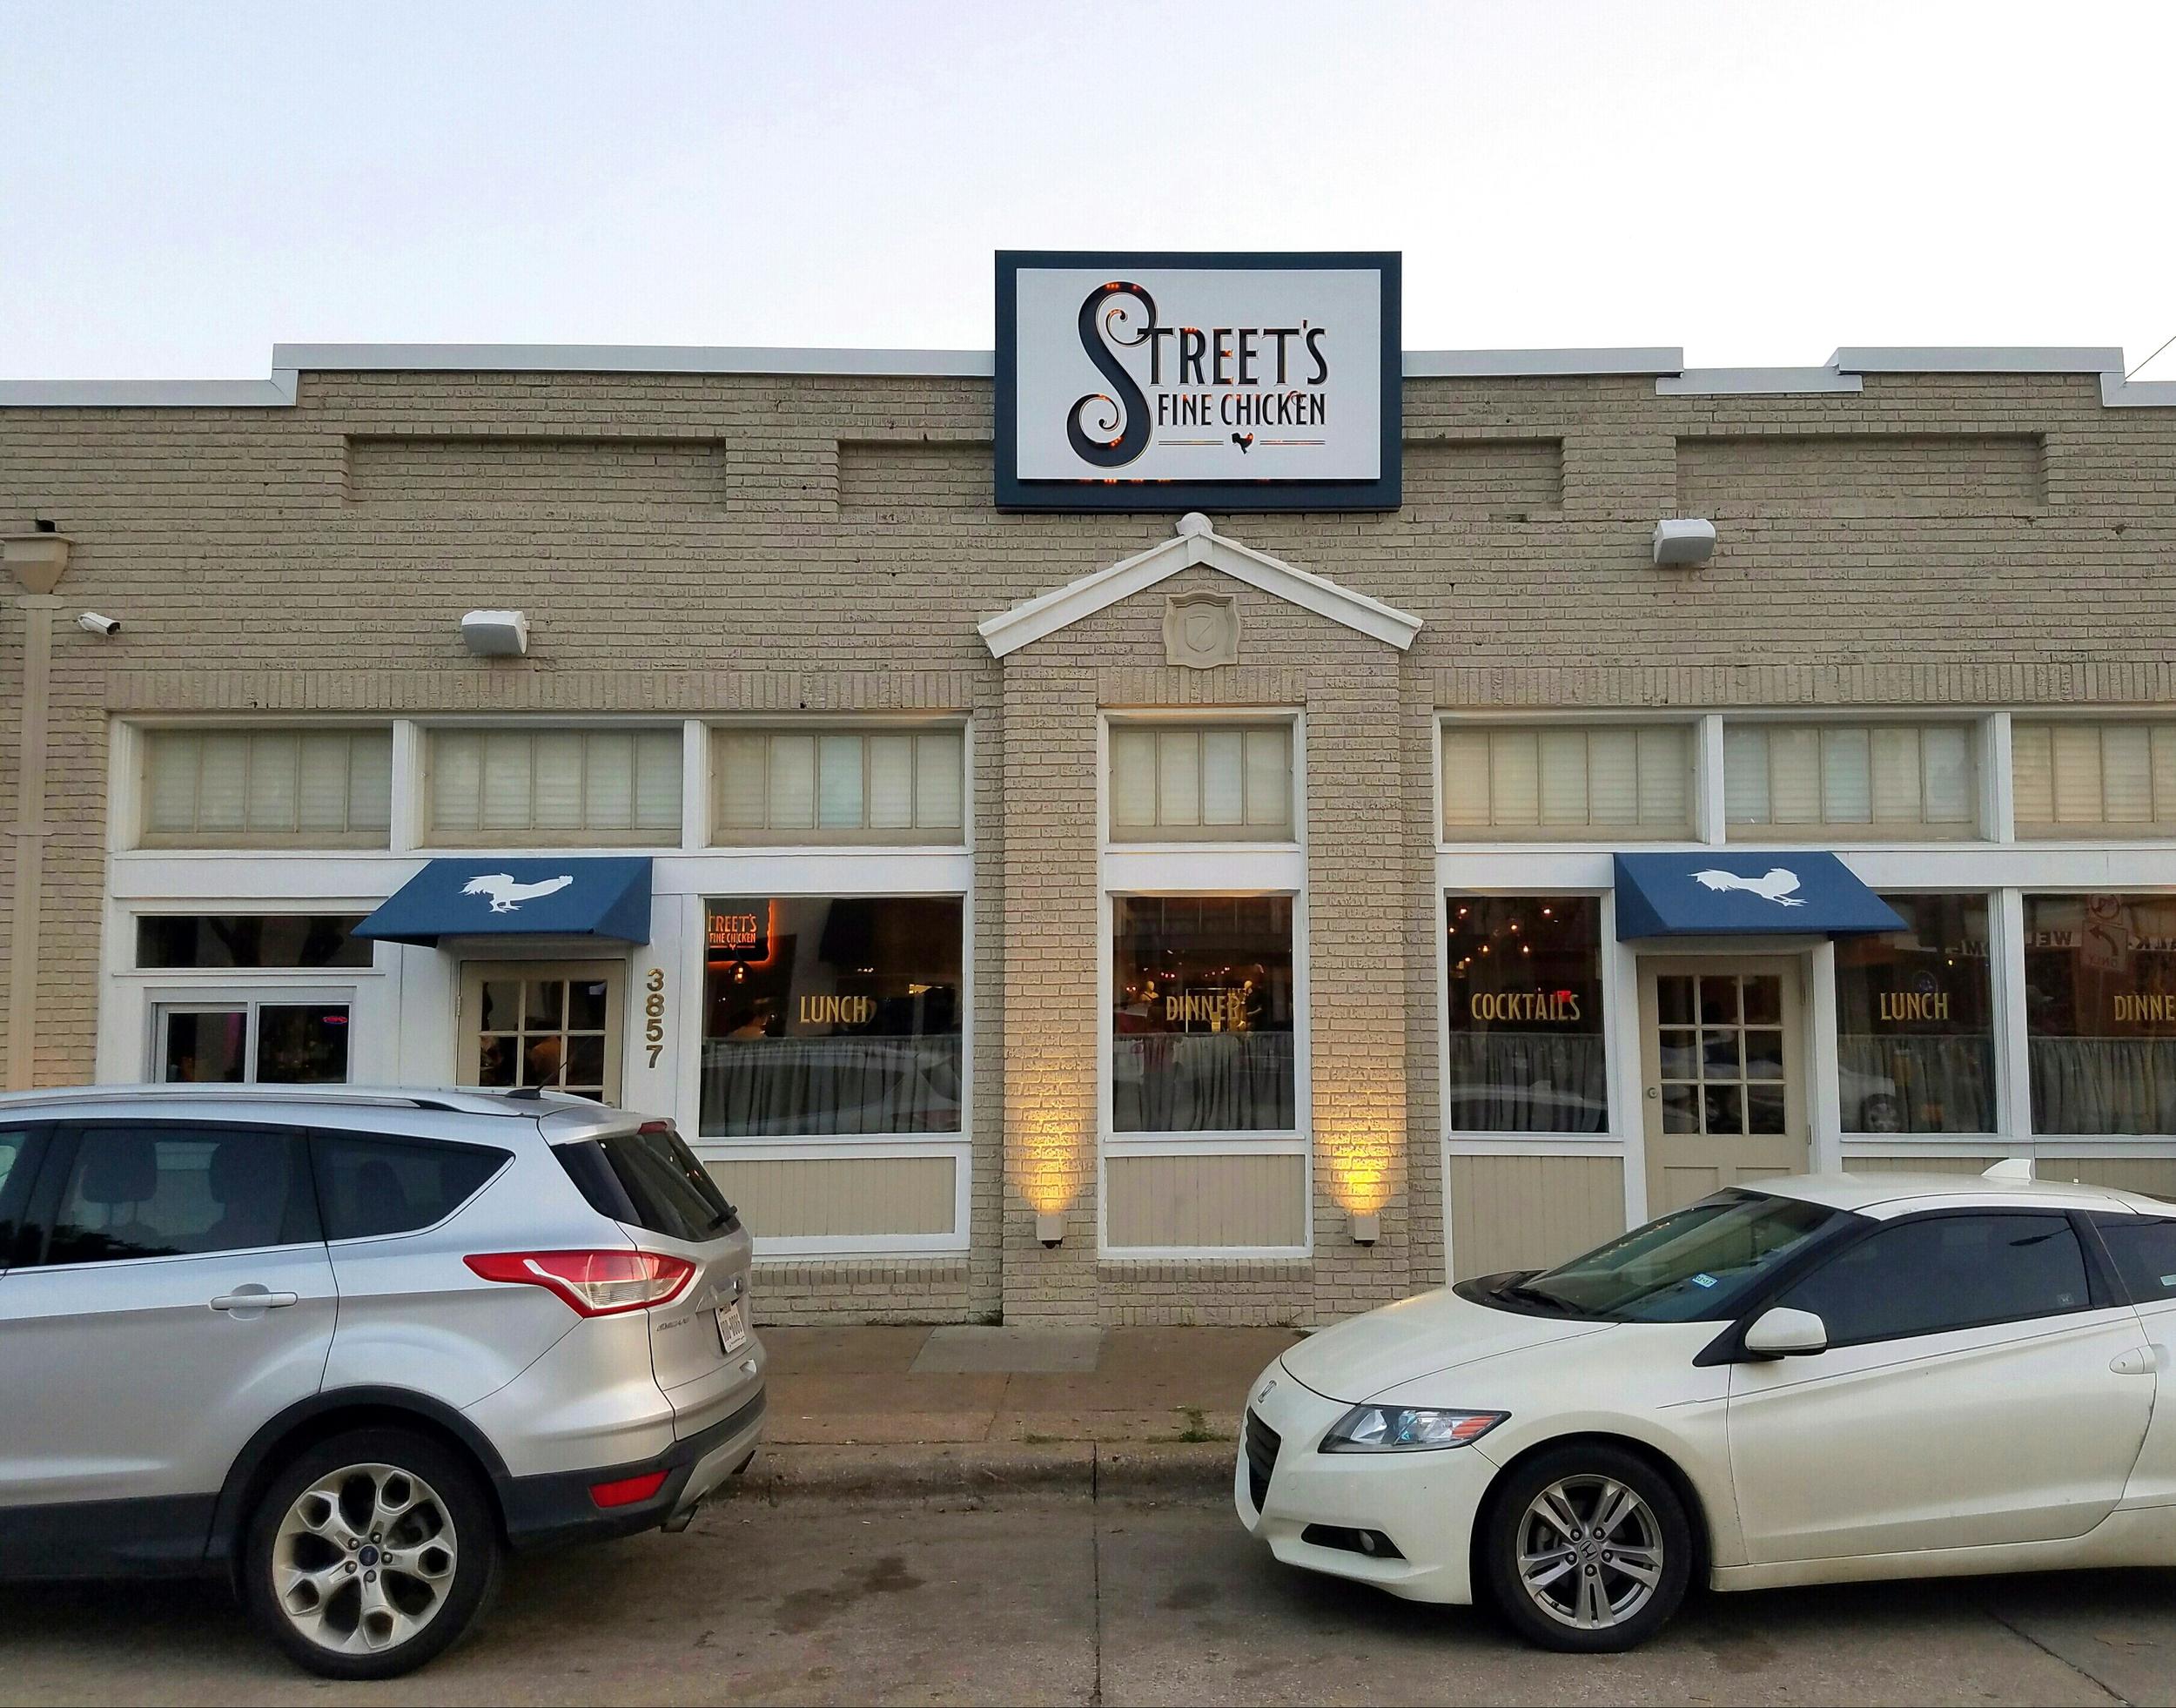 streets-fine-chicken-exterior-dallas-texas